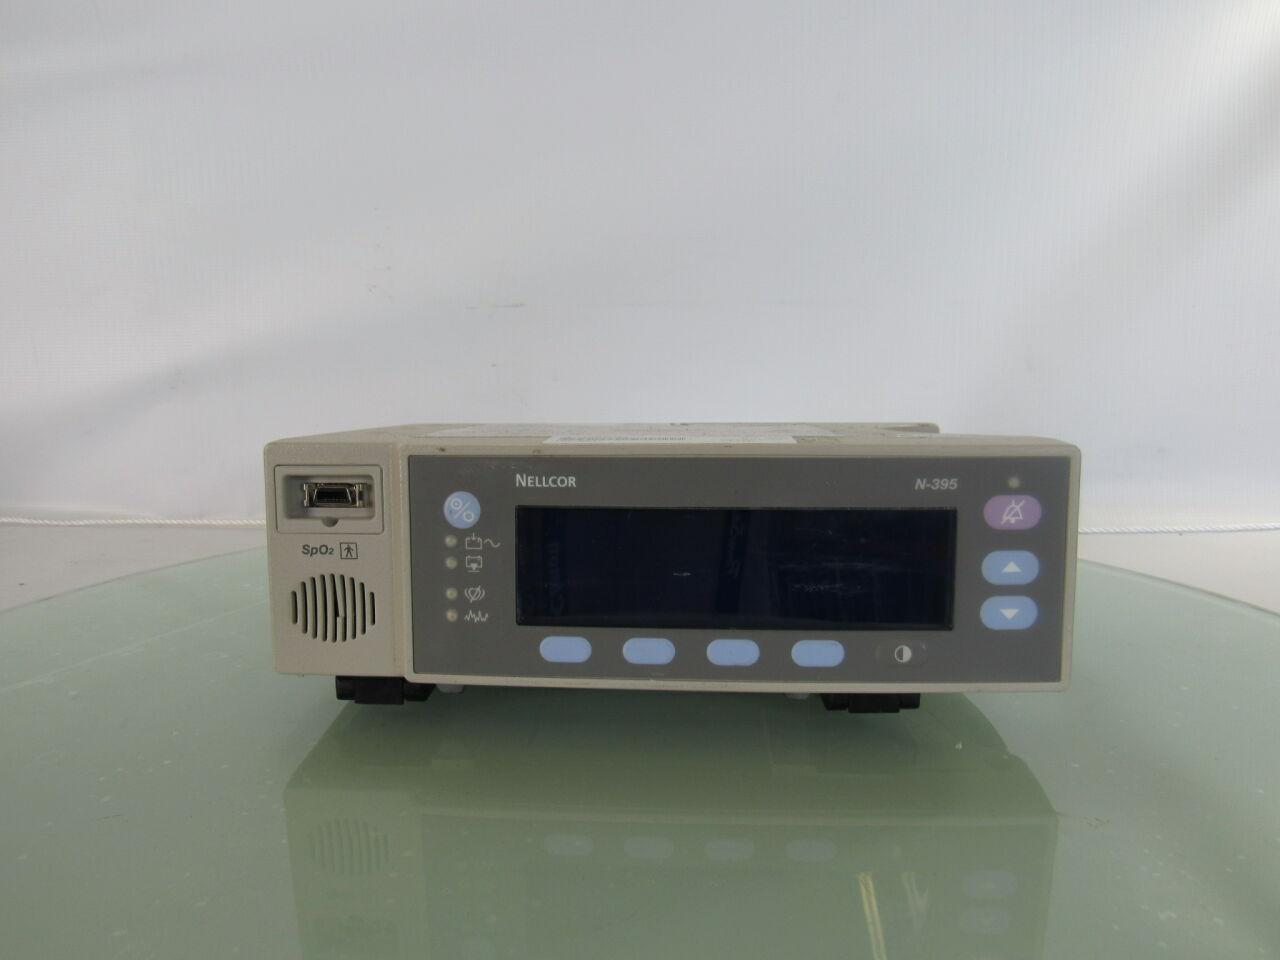 NELLCOR N-395 Oximeter - Pulse